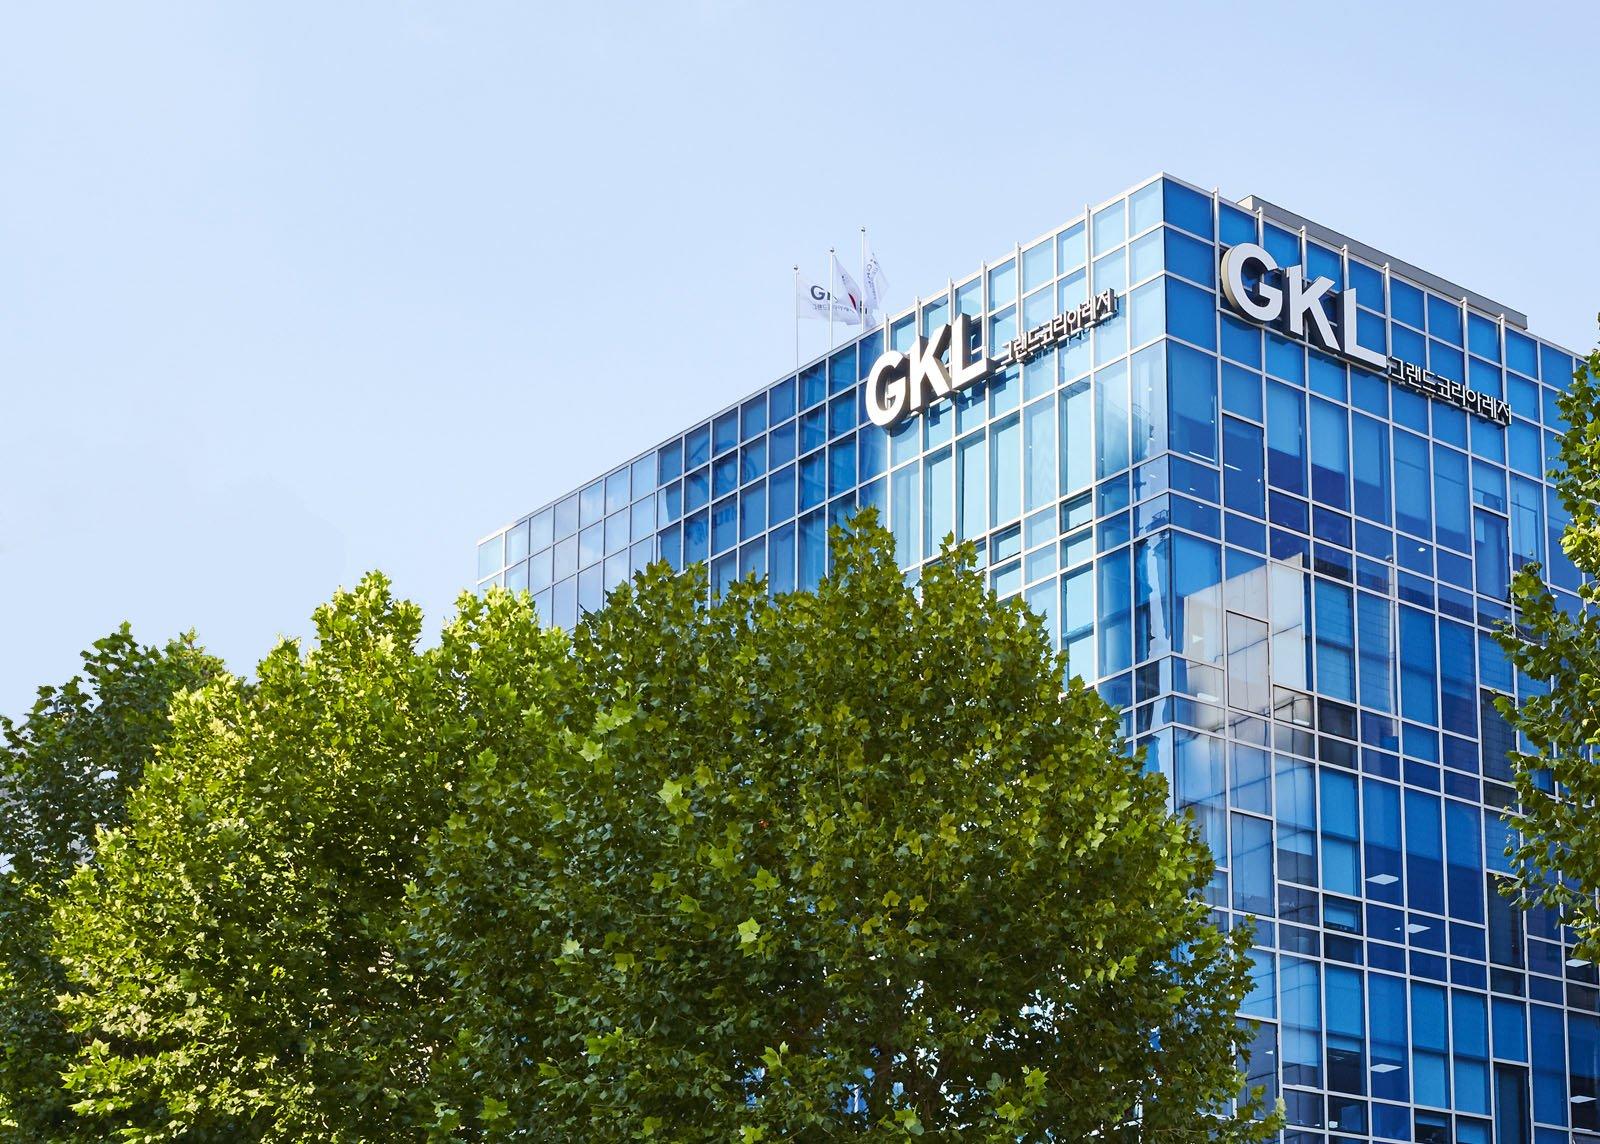 GKL South Korea Report 51%  Casino Sale Drop Sequentially In Nov